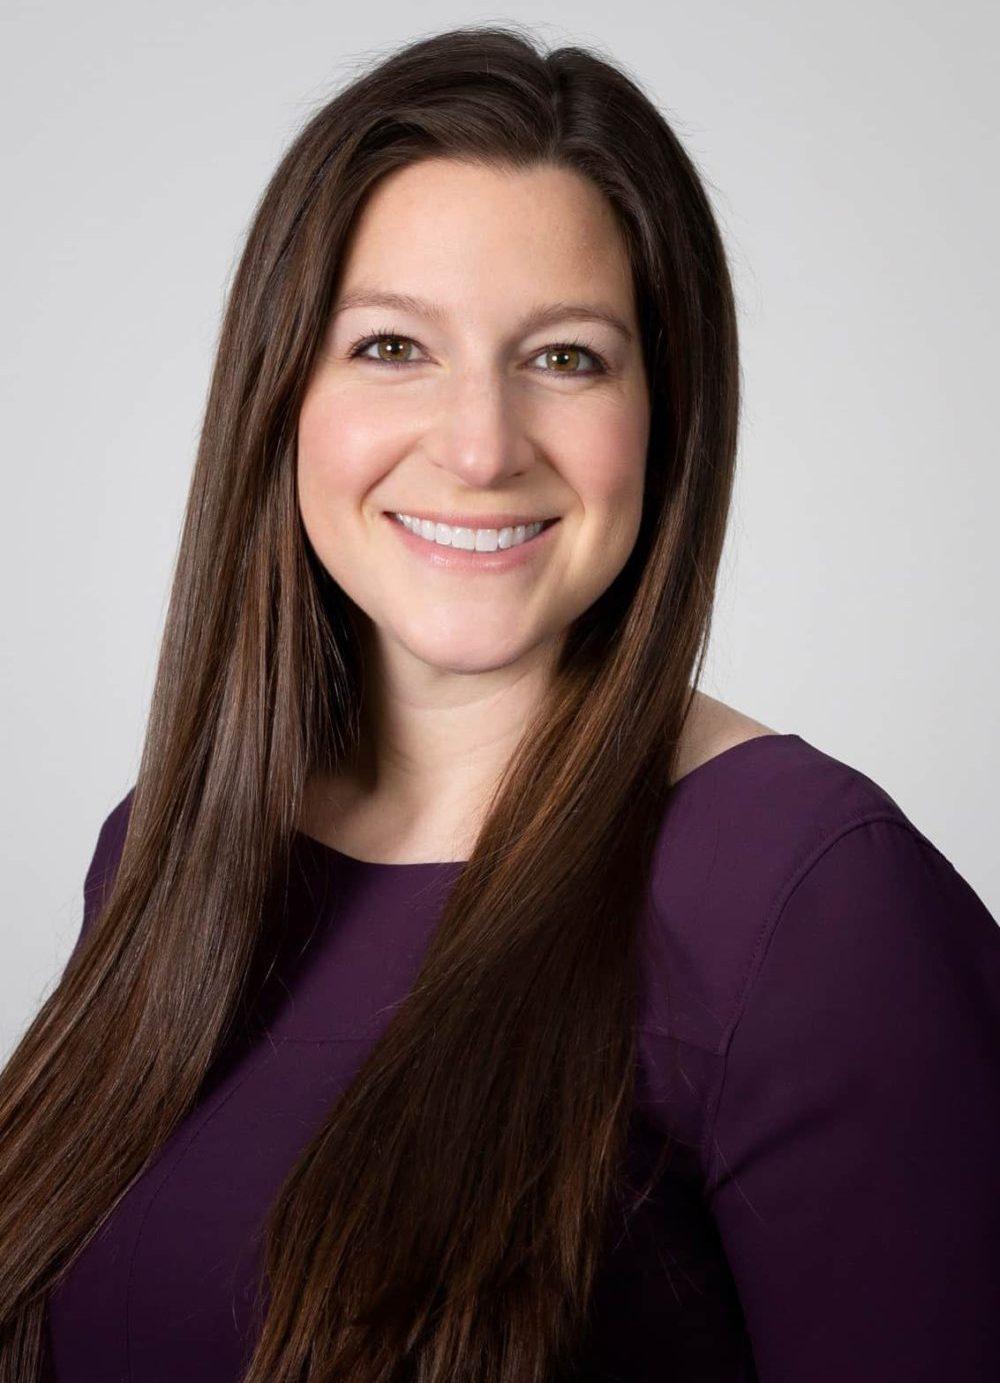 Ashley Marie Hardesty, MSN, FNP - C